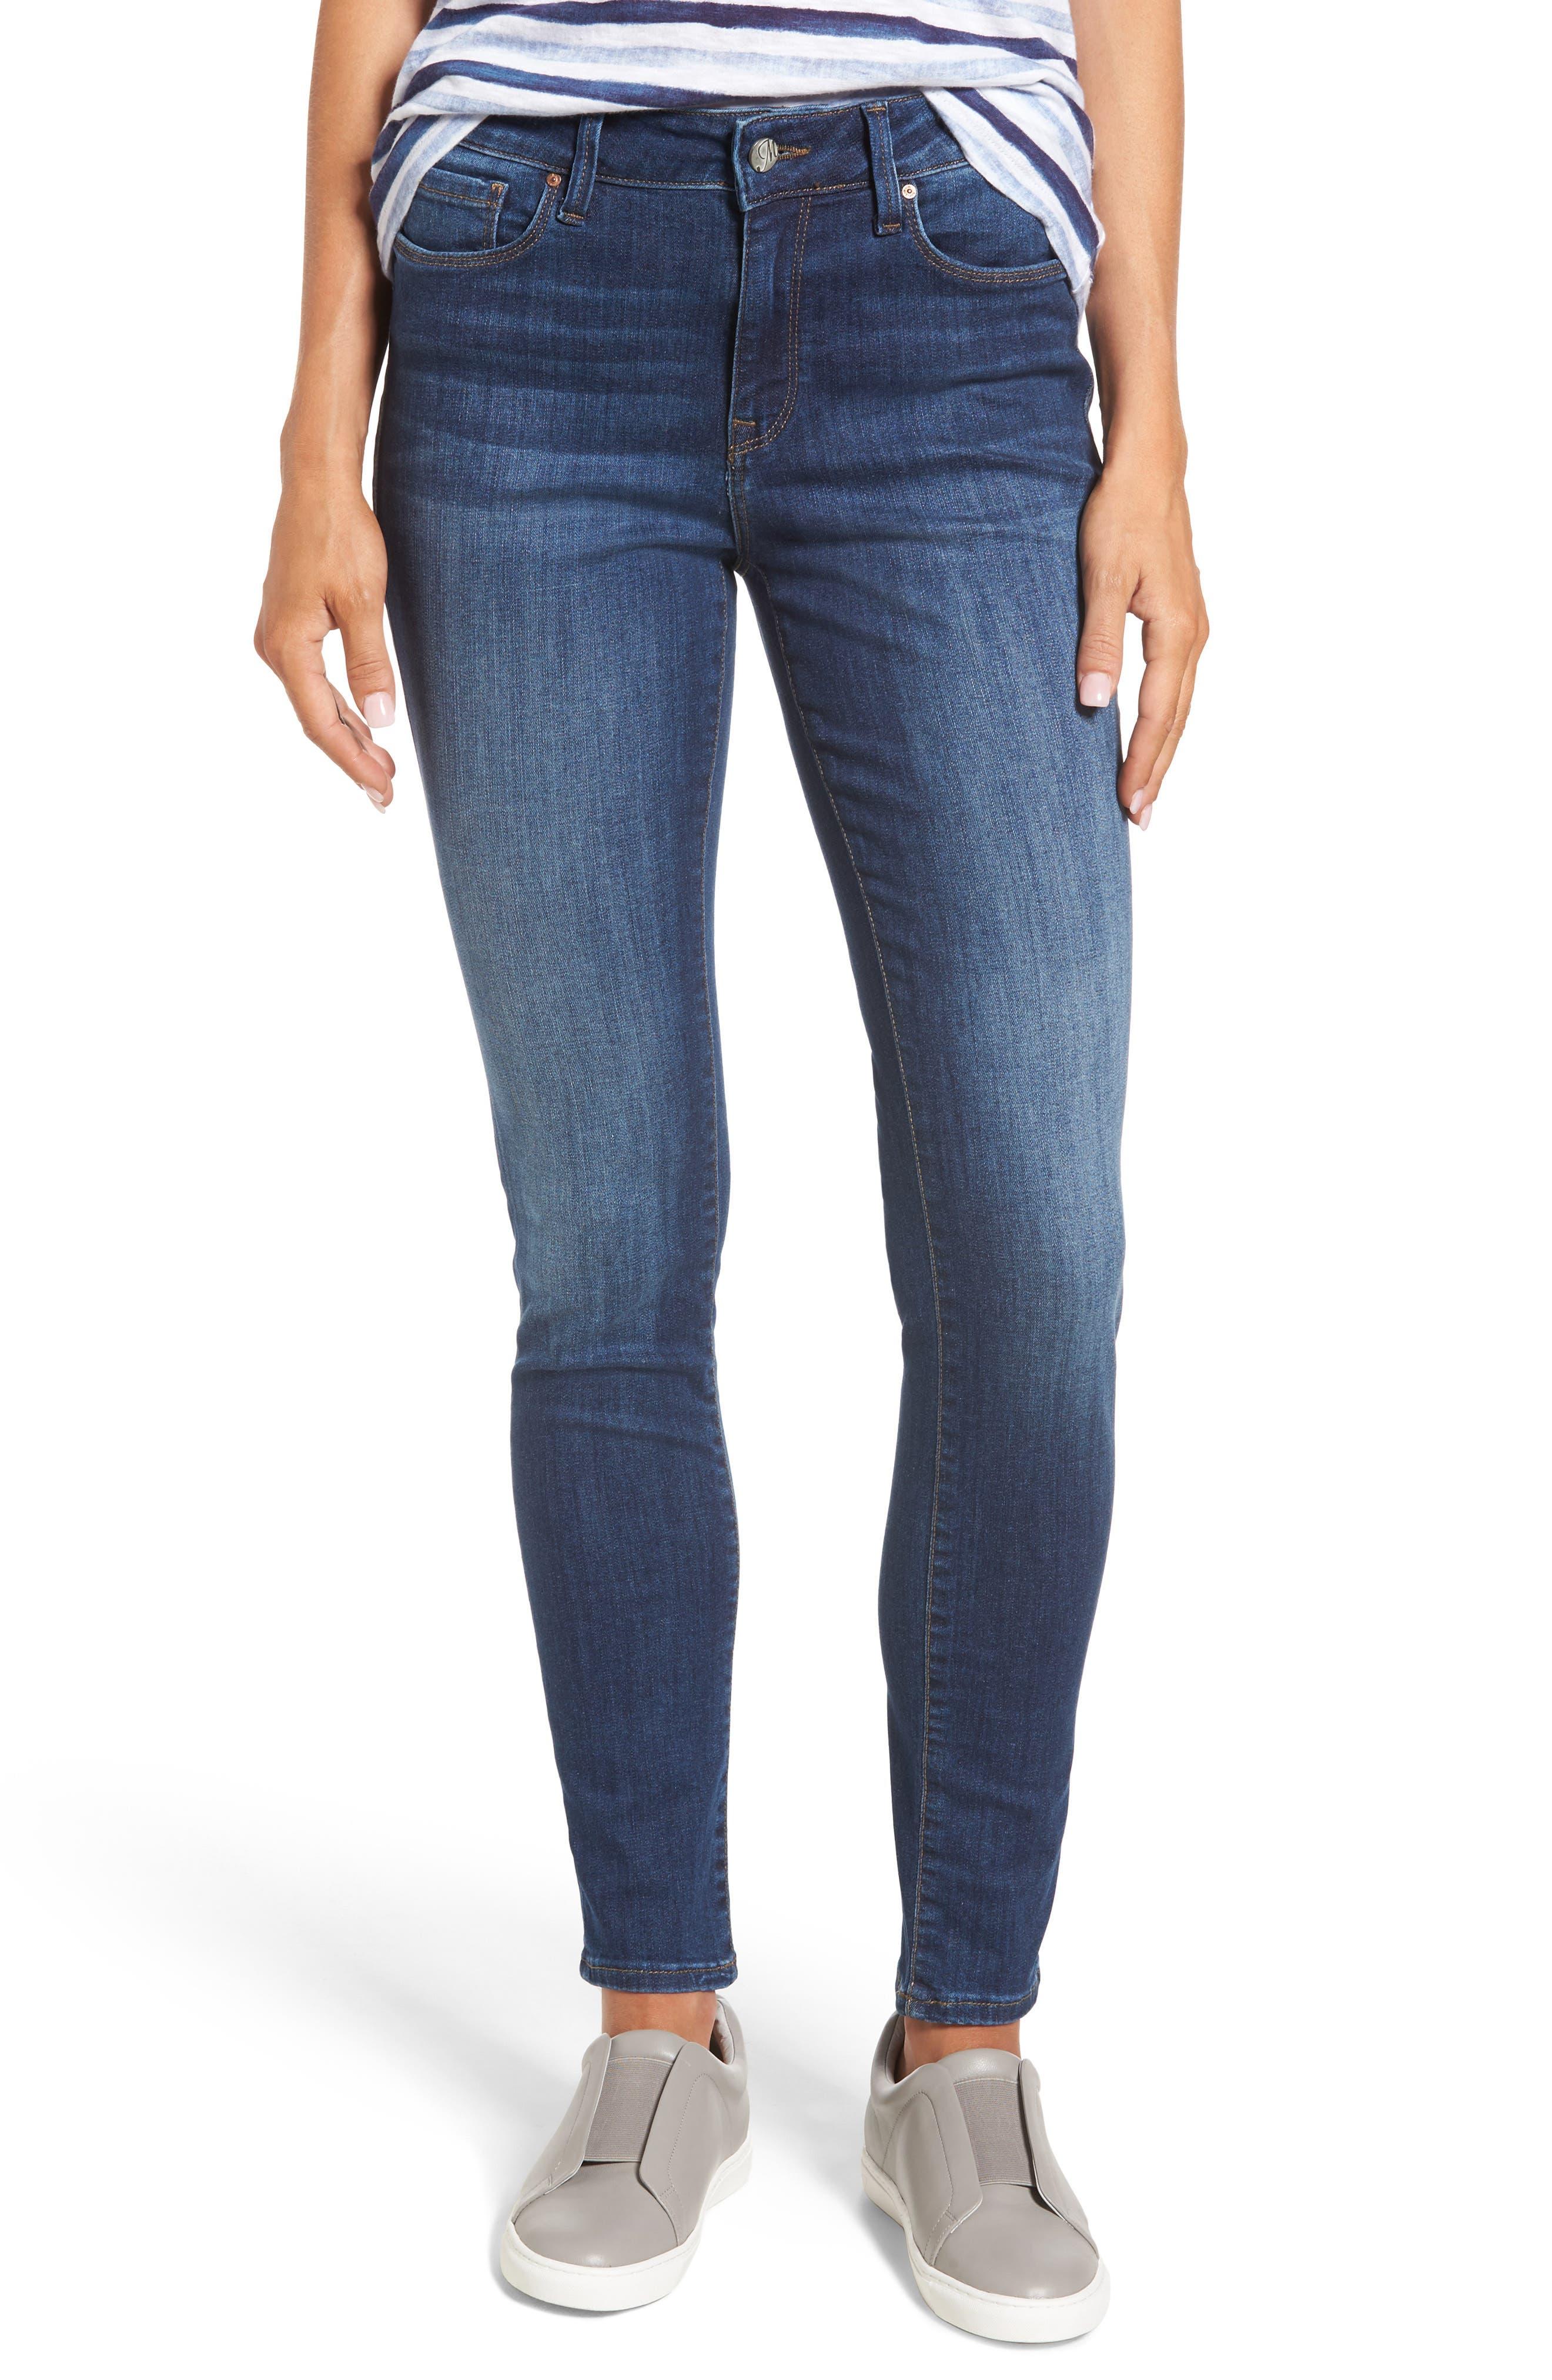 Alissa Super Skinny Jeans,                         Main,                         color, 401